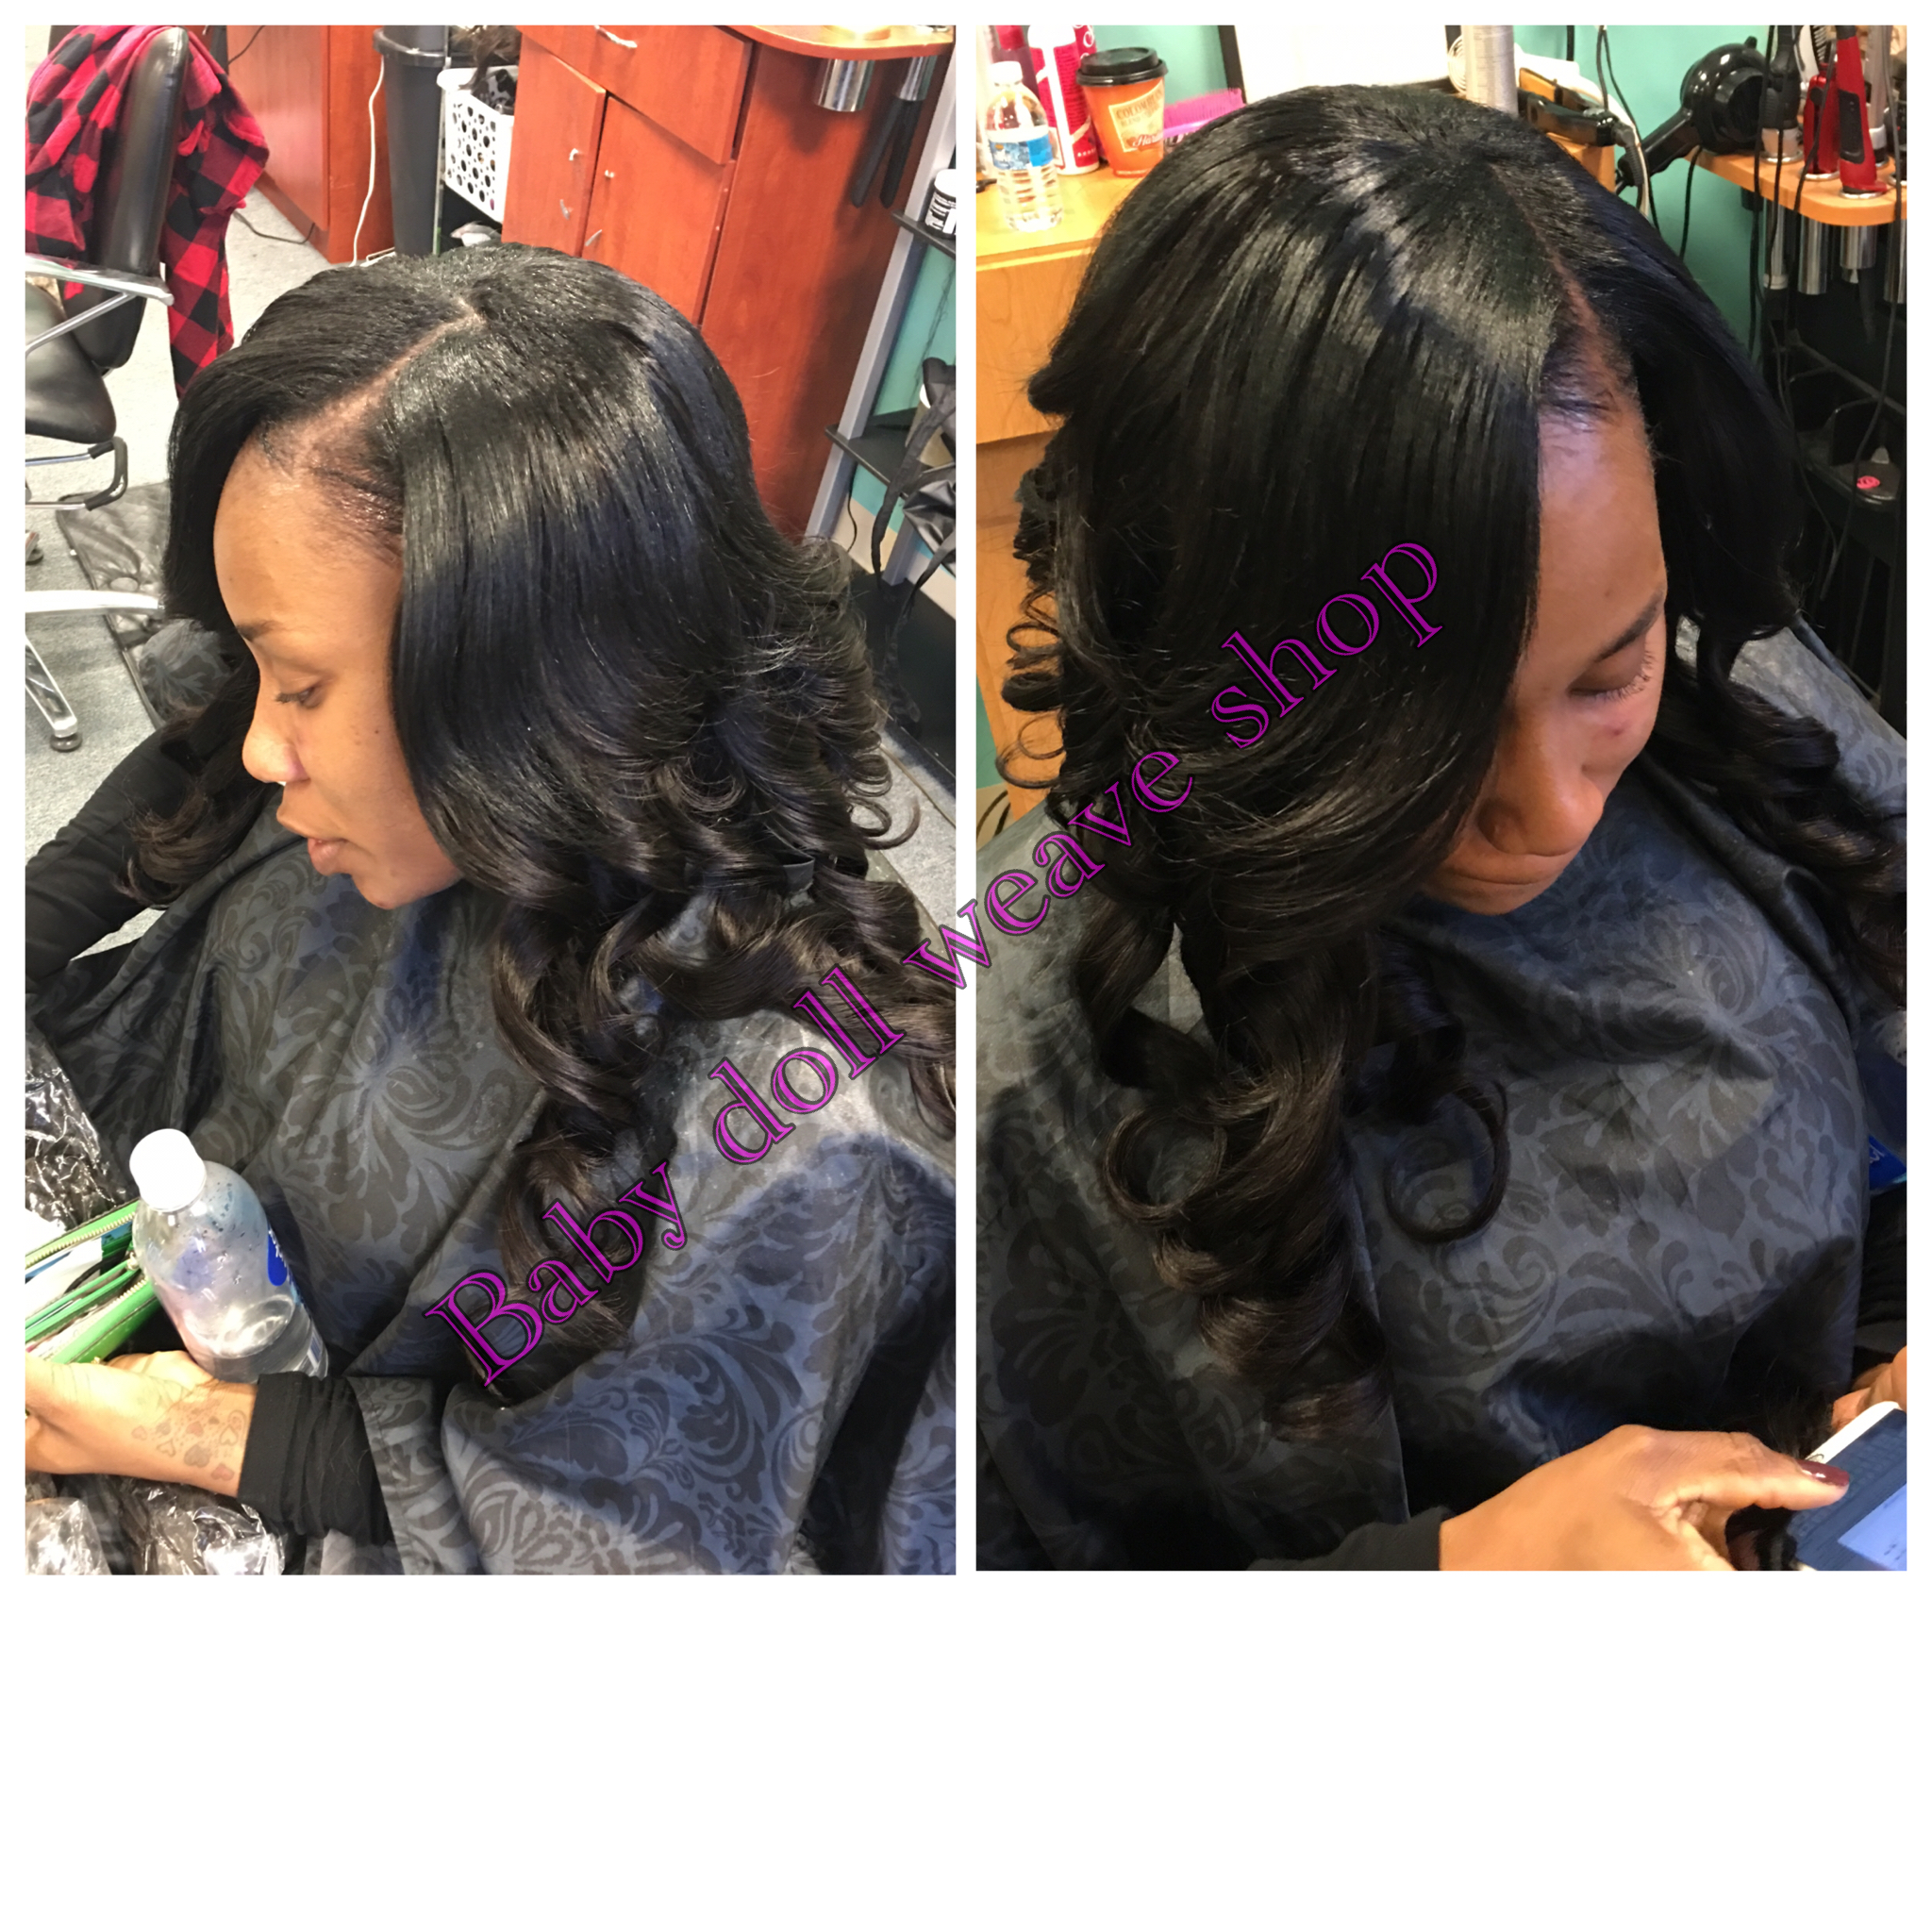 Baby Dolls Hair Loss Salon Spa 590 Carl Vinson Pkwy Ste 800